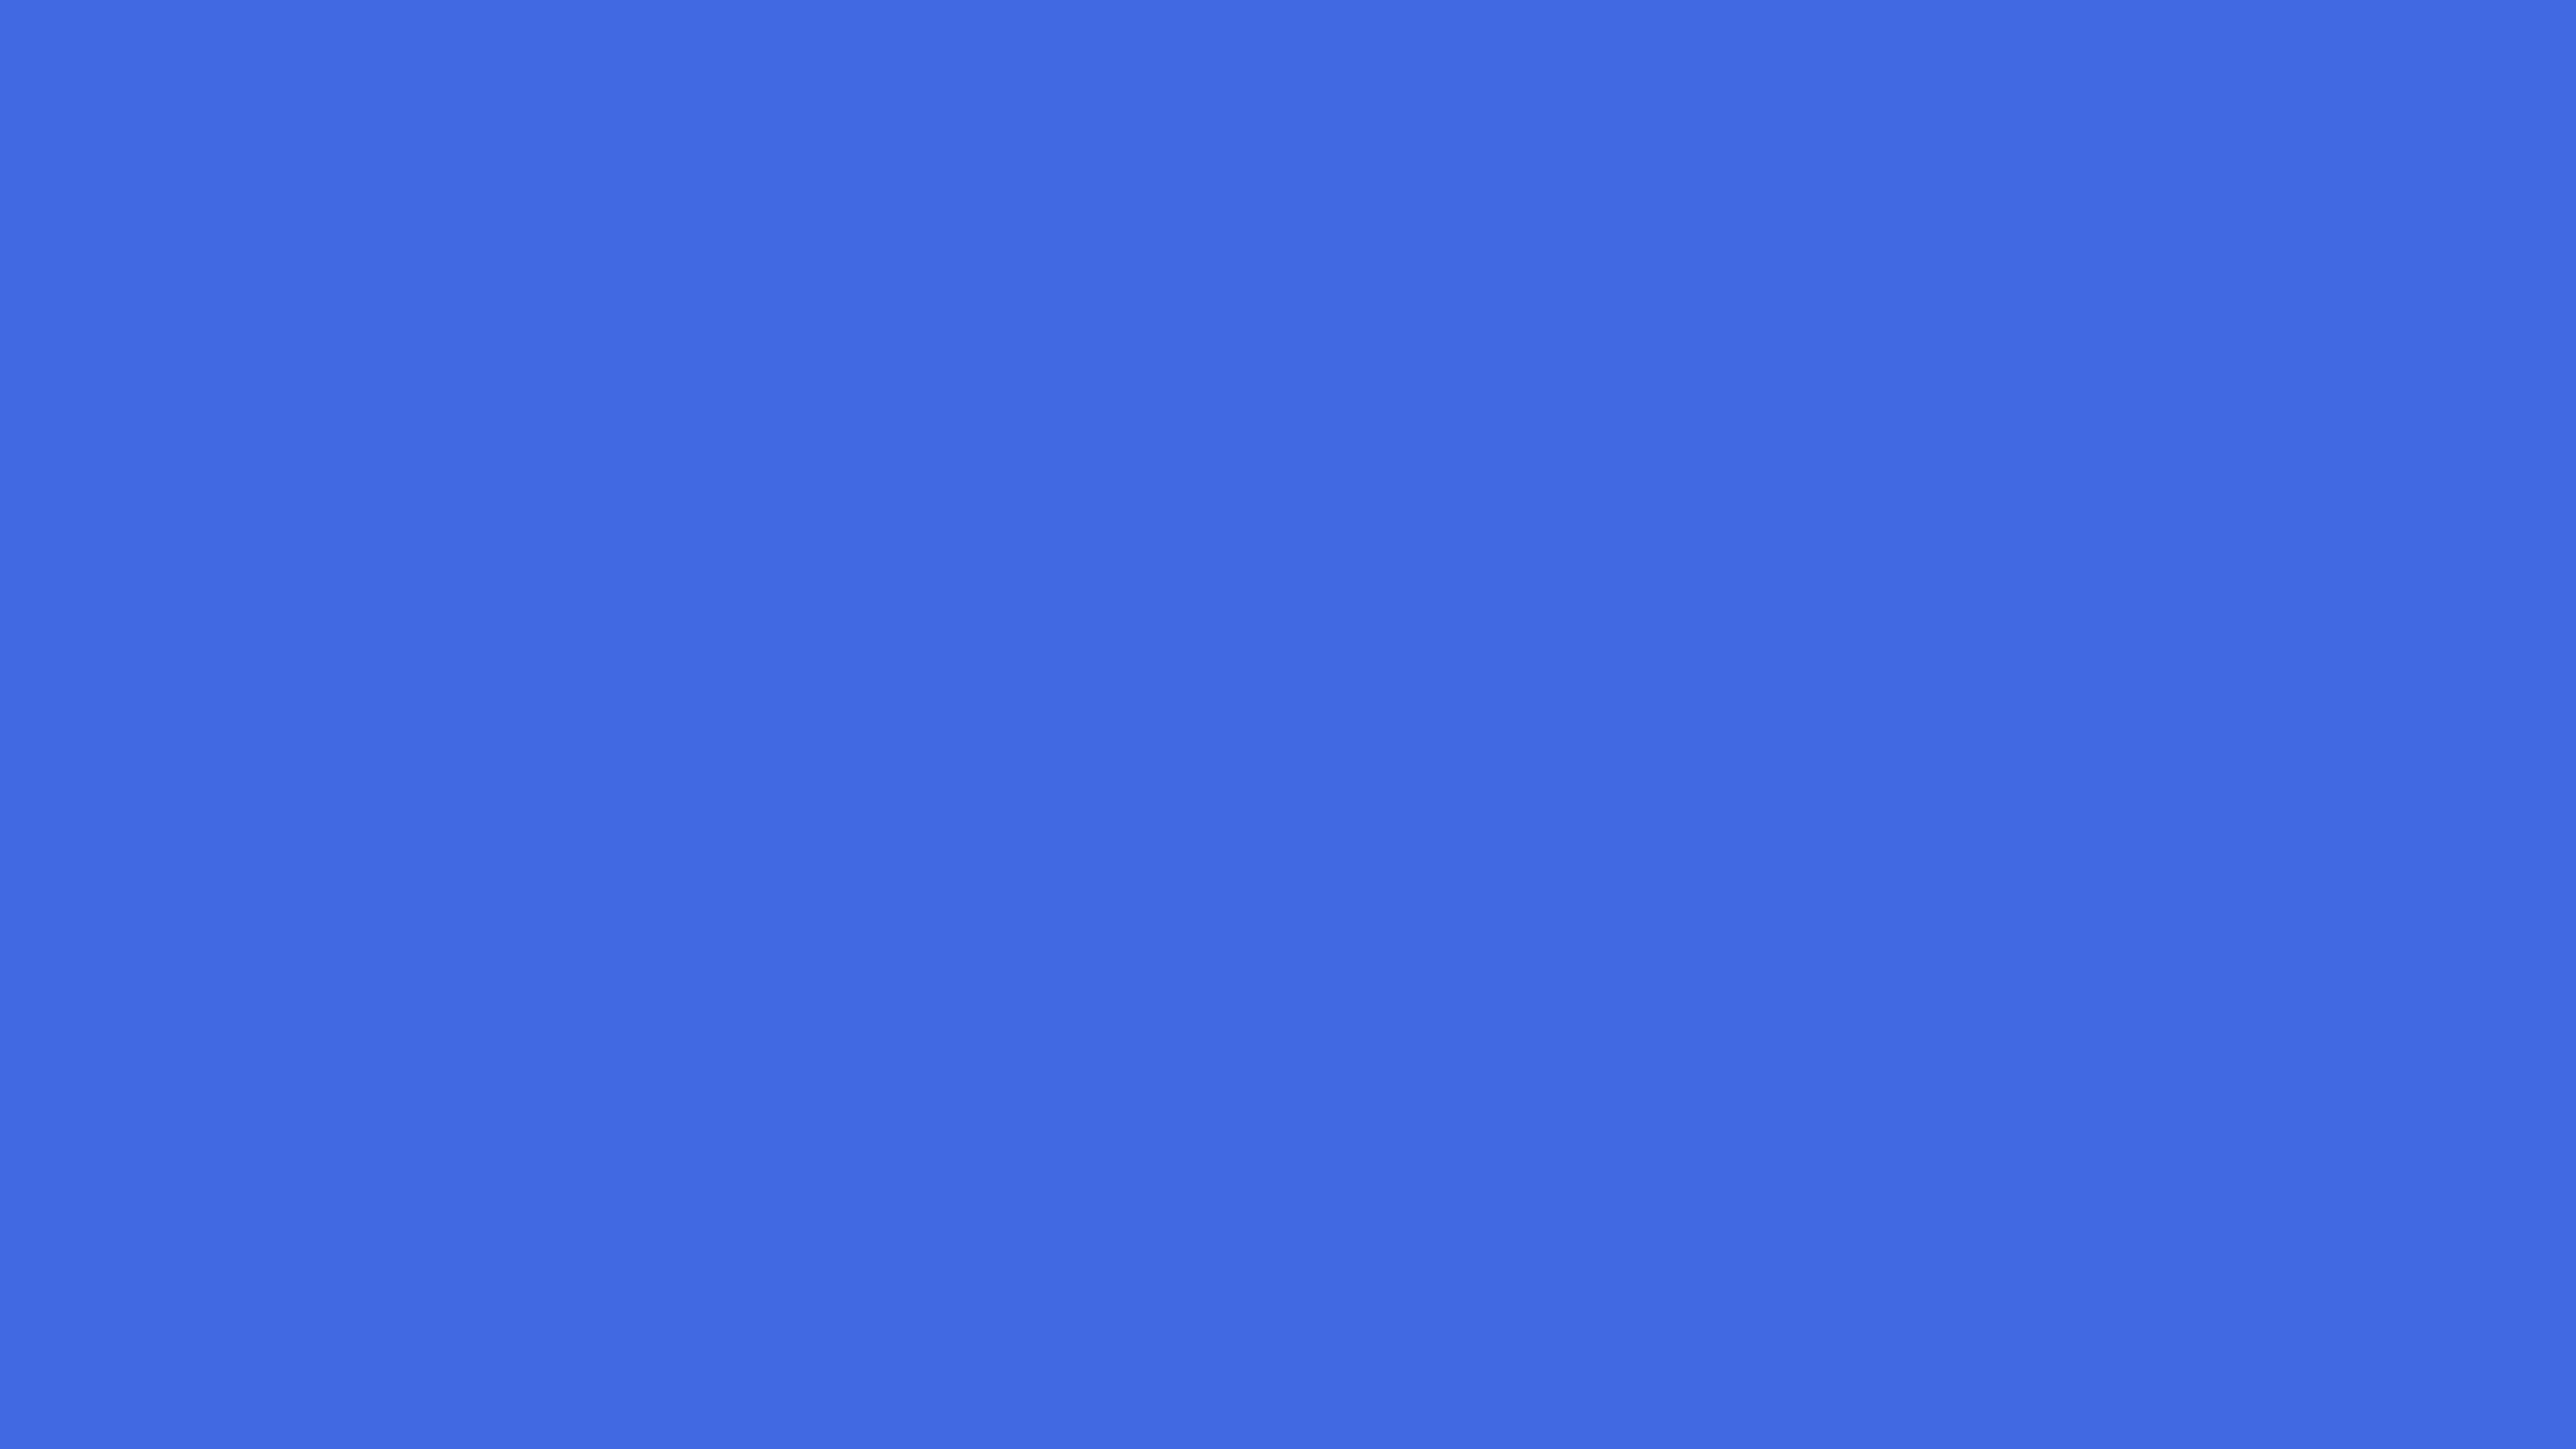 5120x2880 Royal Blue Web Solid Color Background